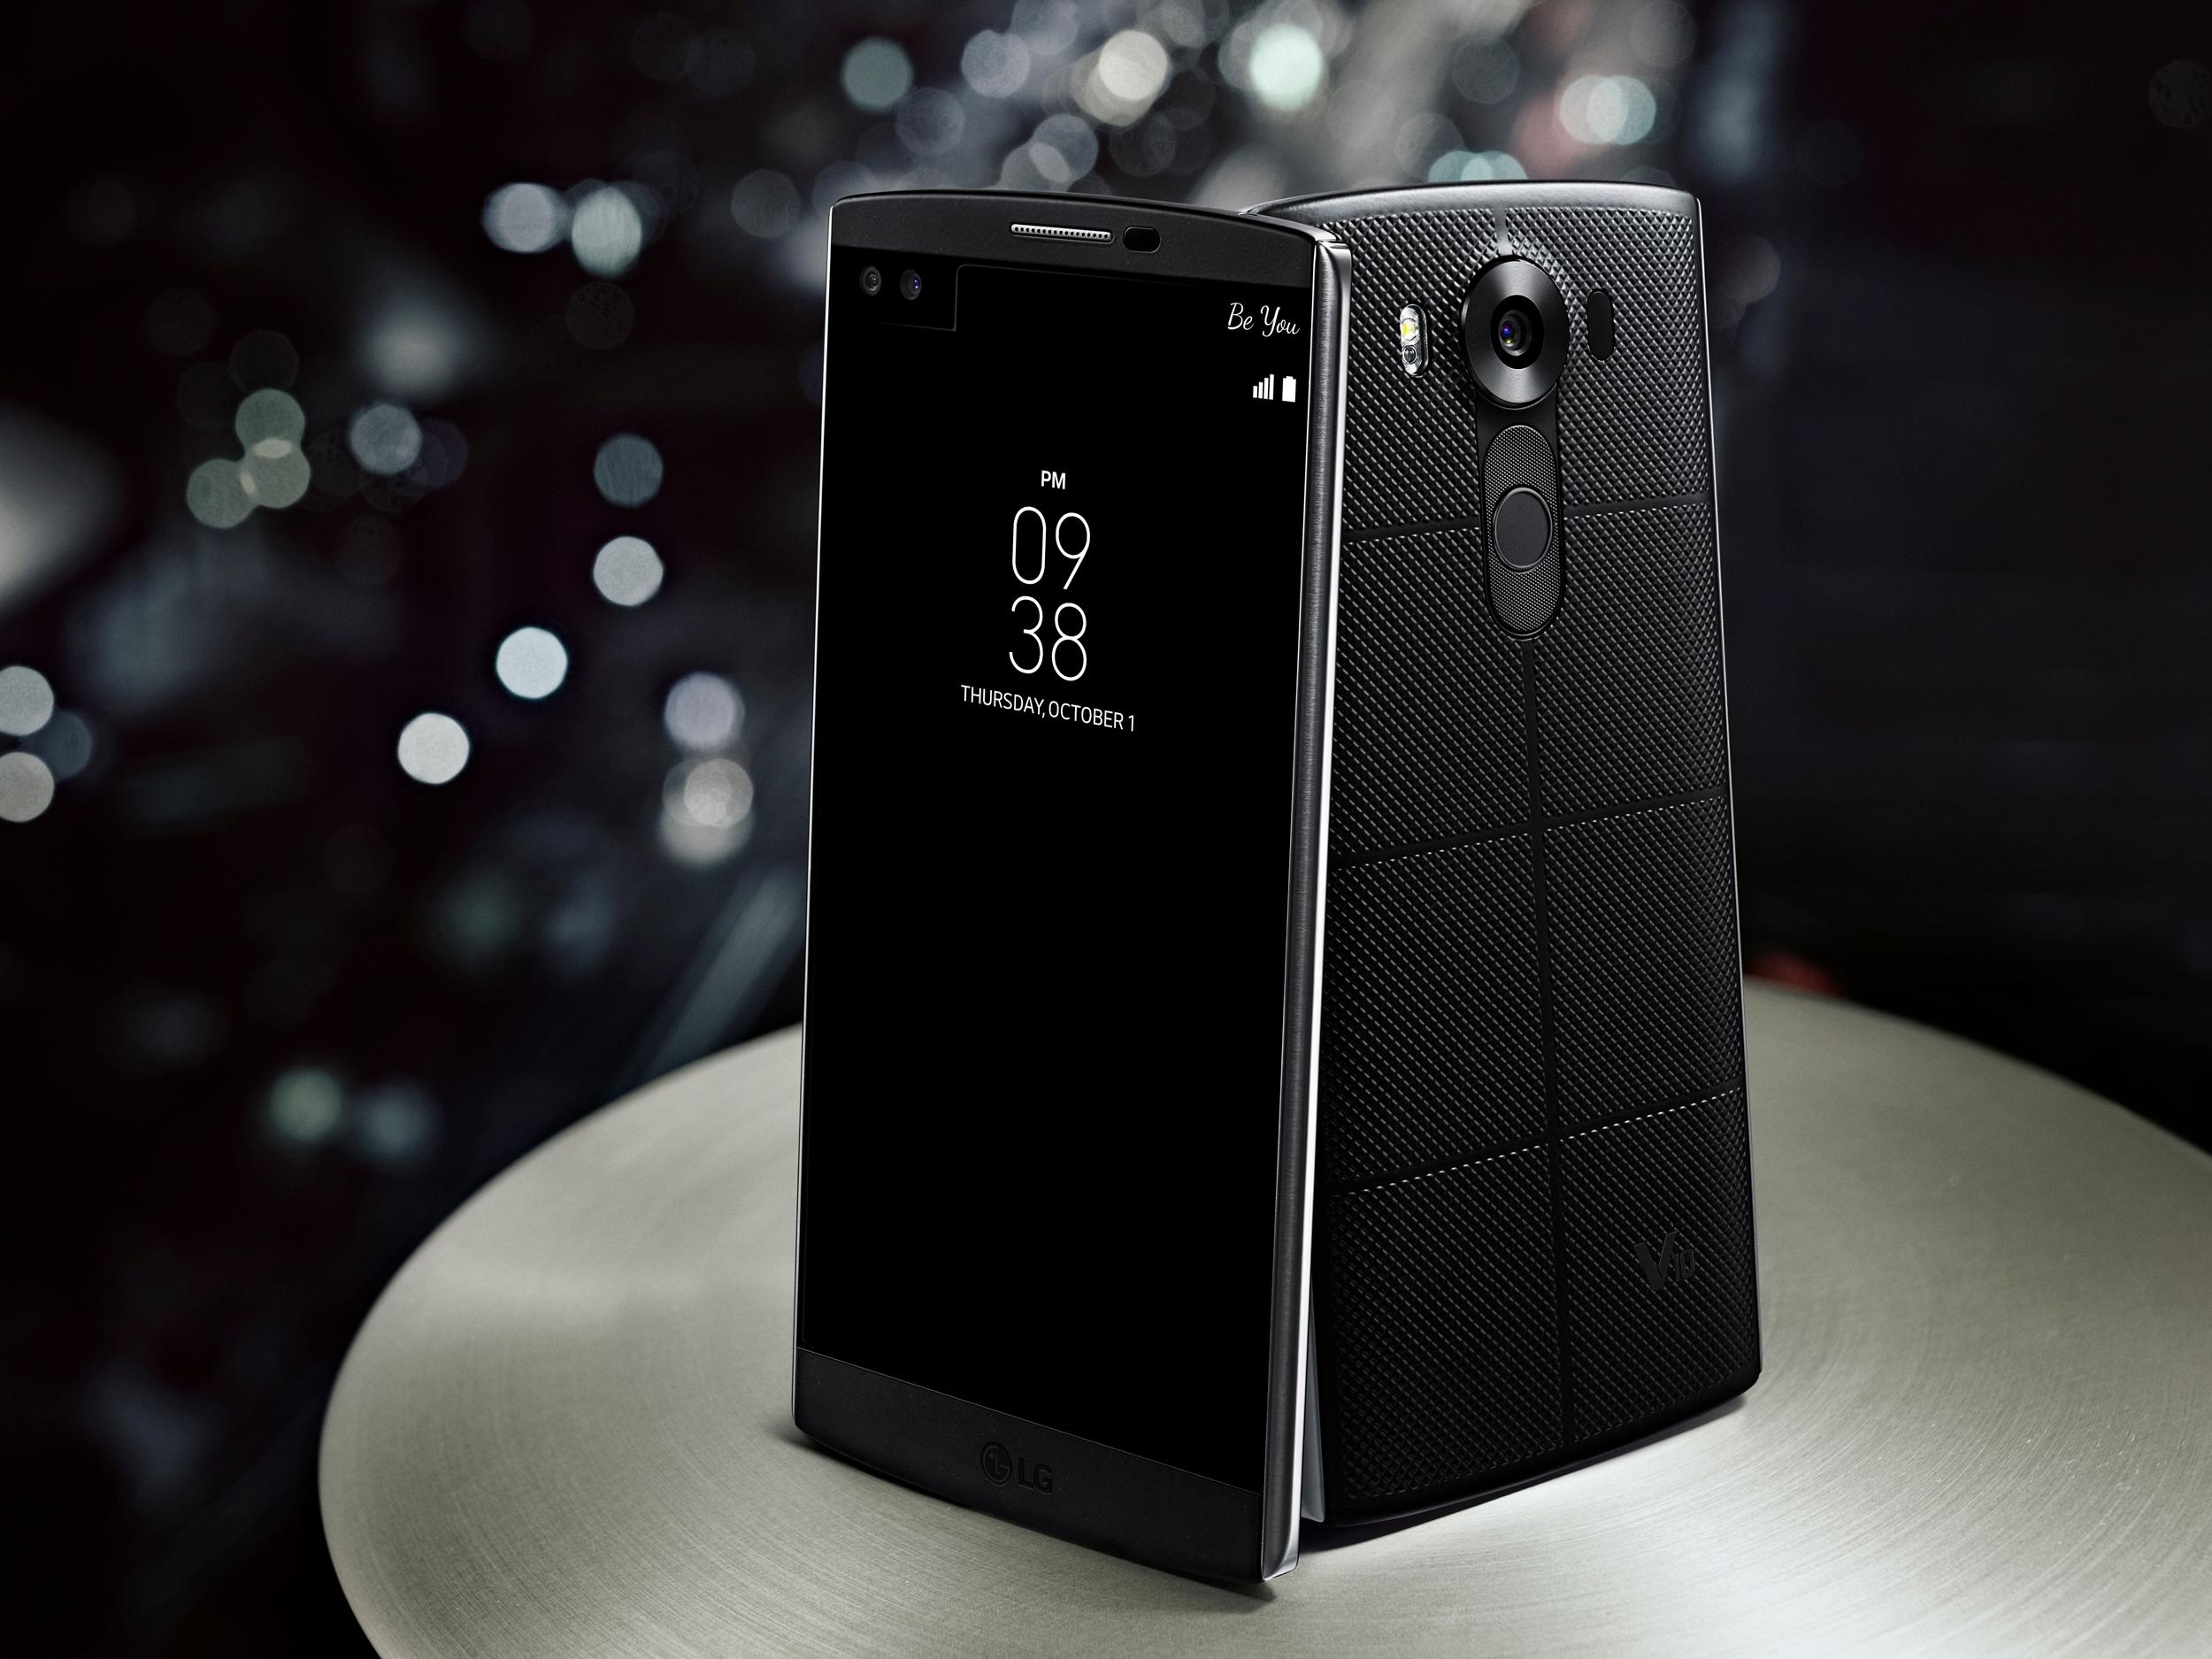 nexus2cee_LG-V10-Black-01